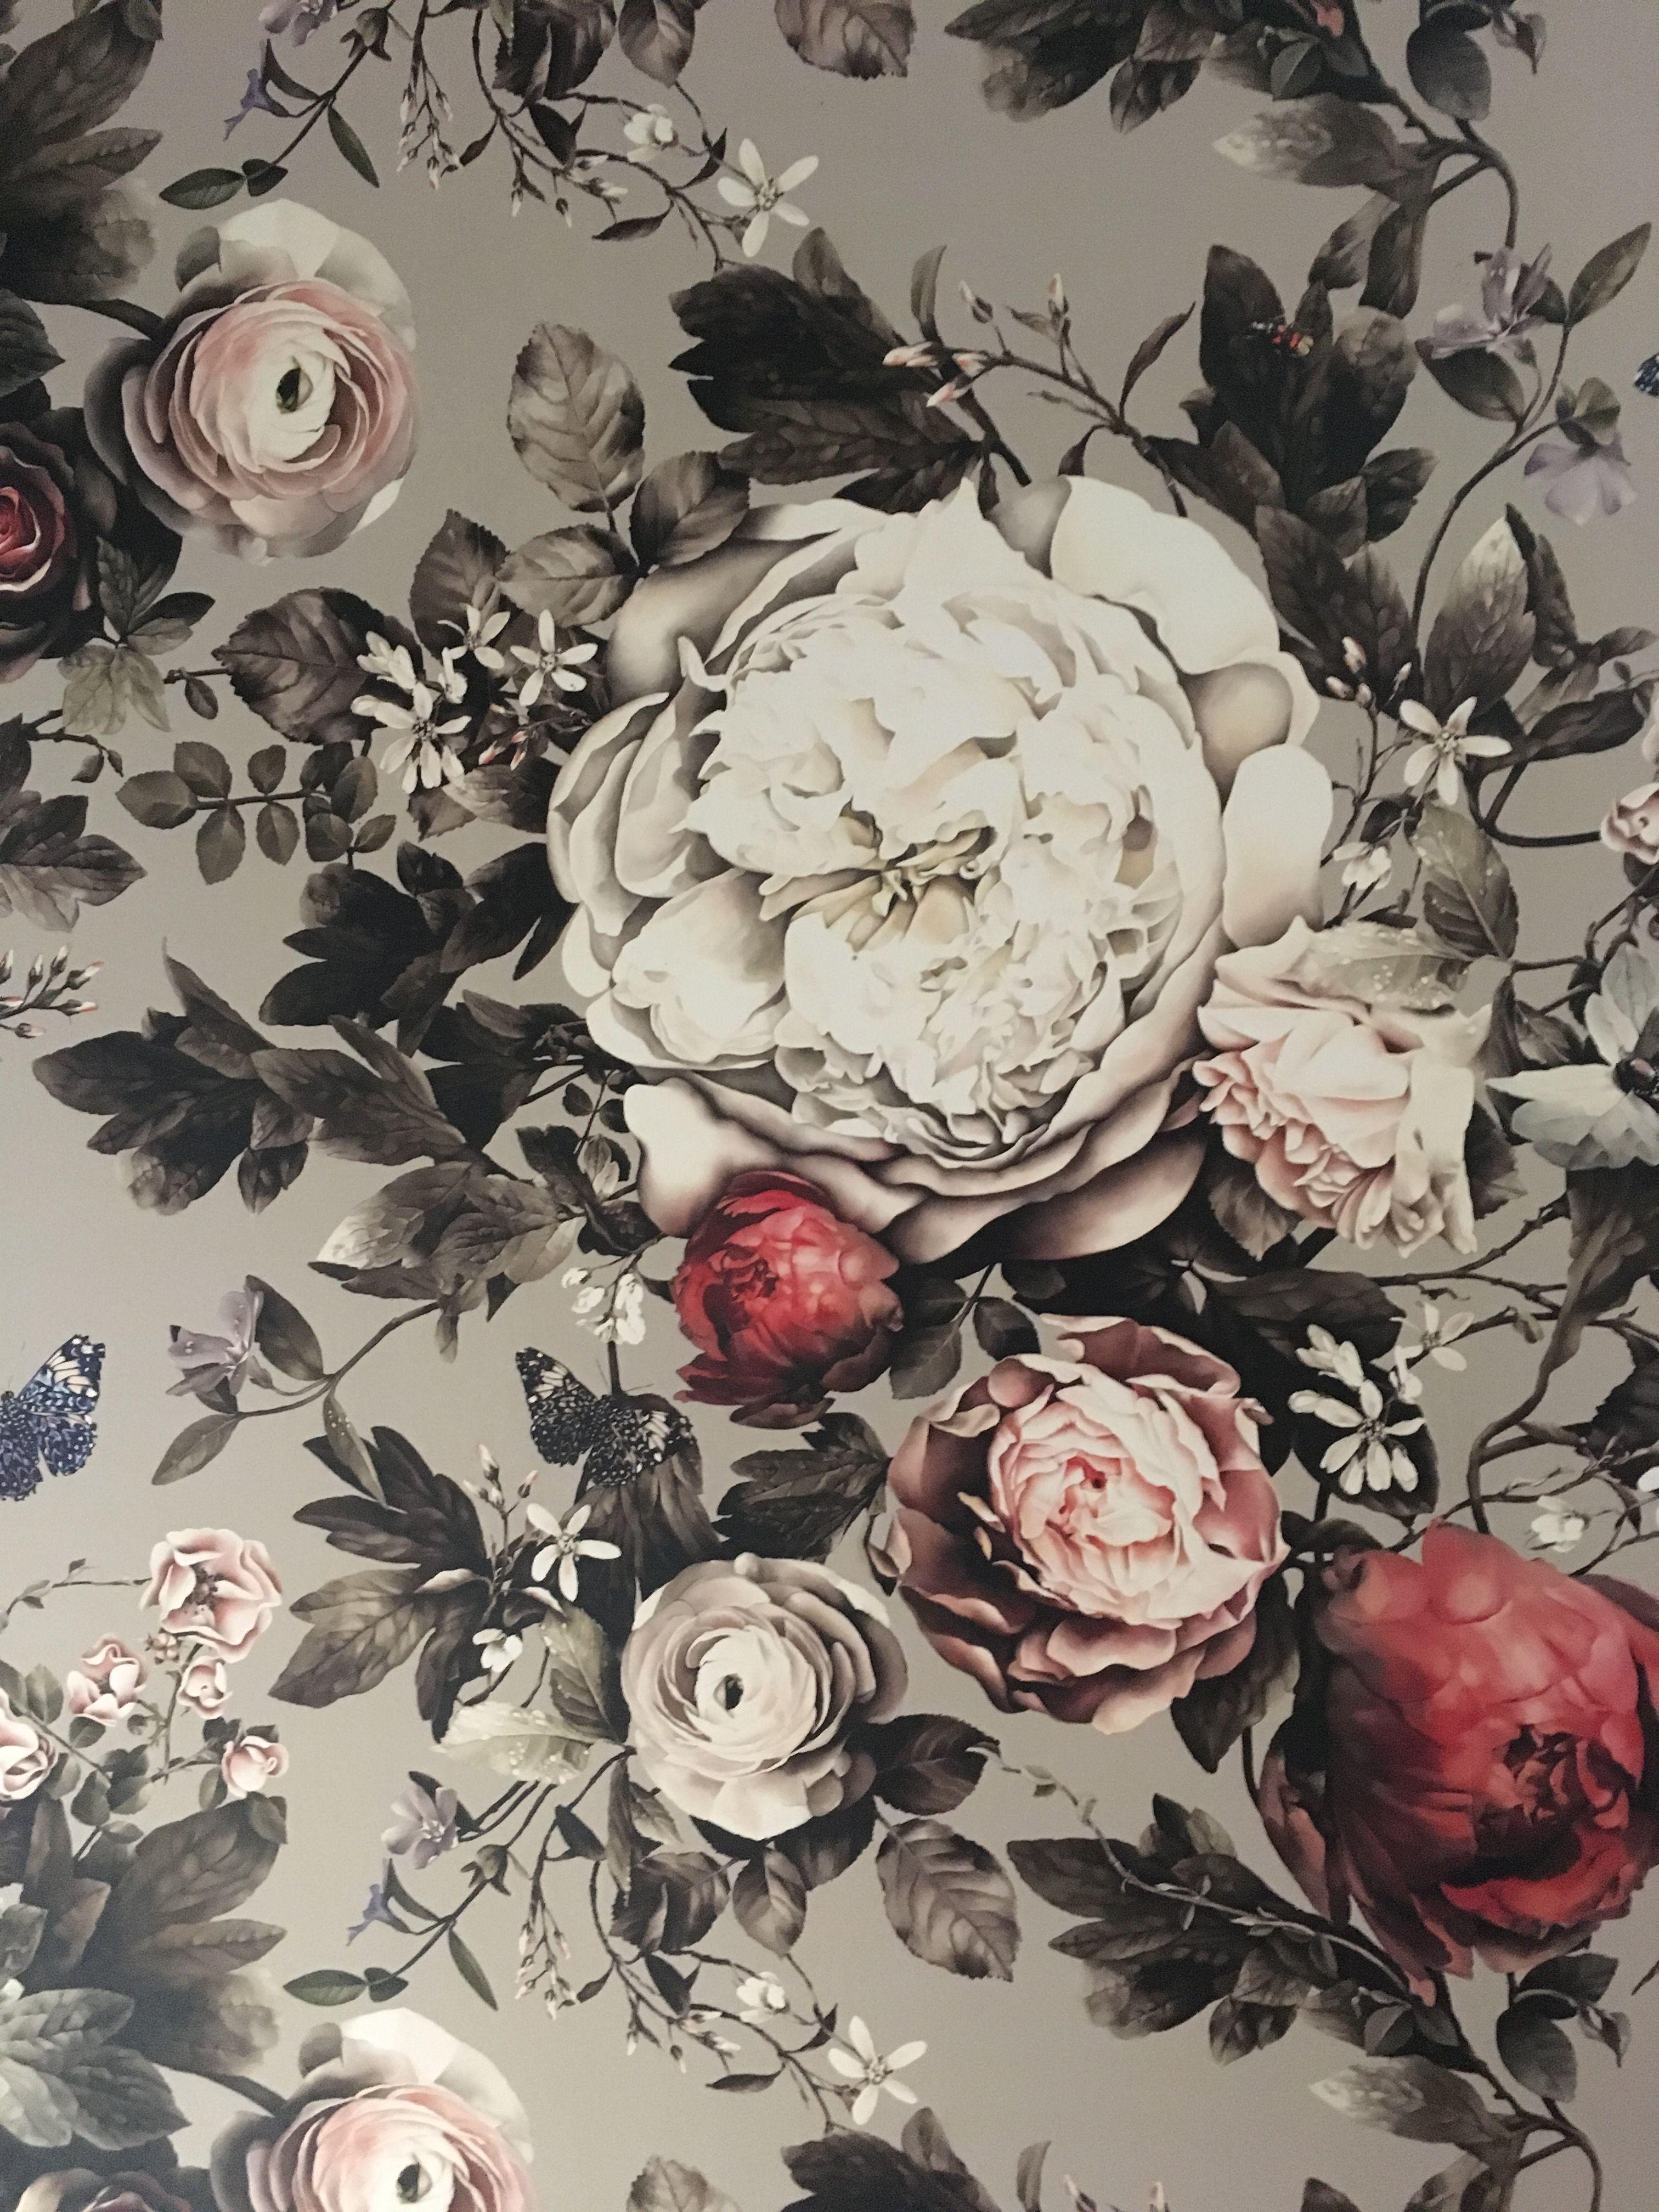 Pin by Aubree Rappenecker on art Flower thigh tattoos